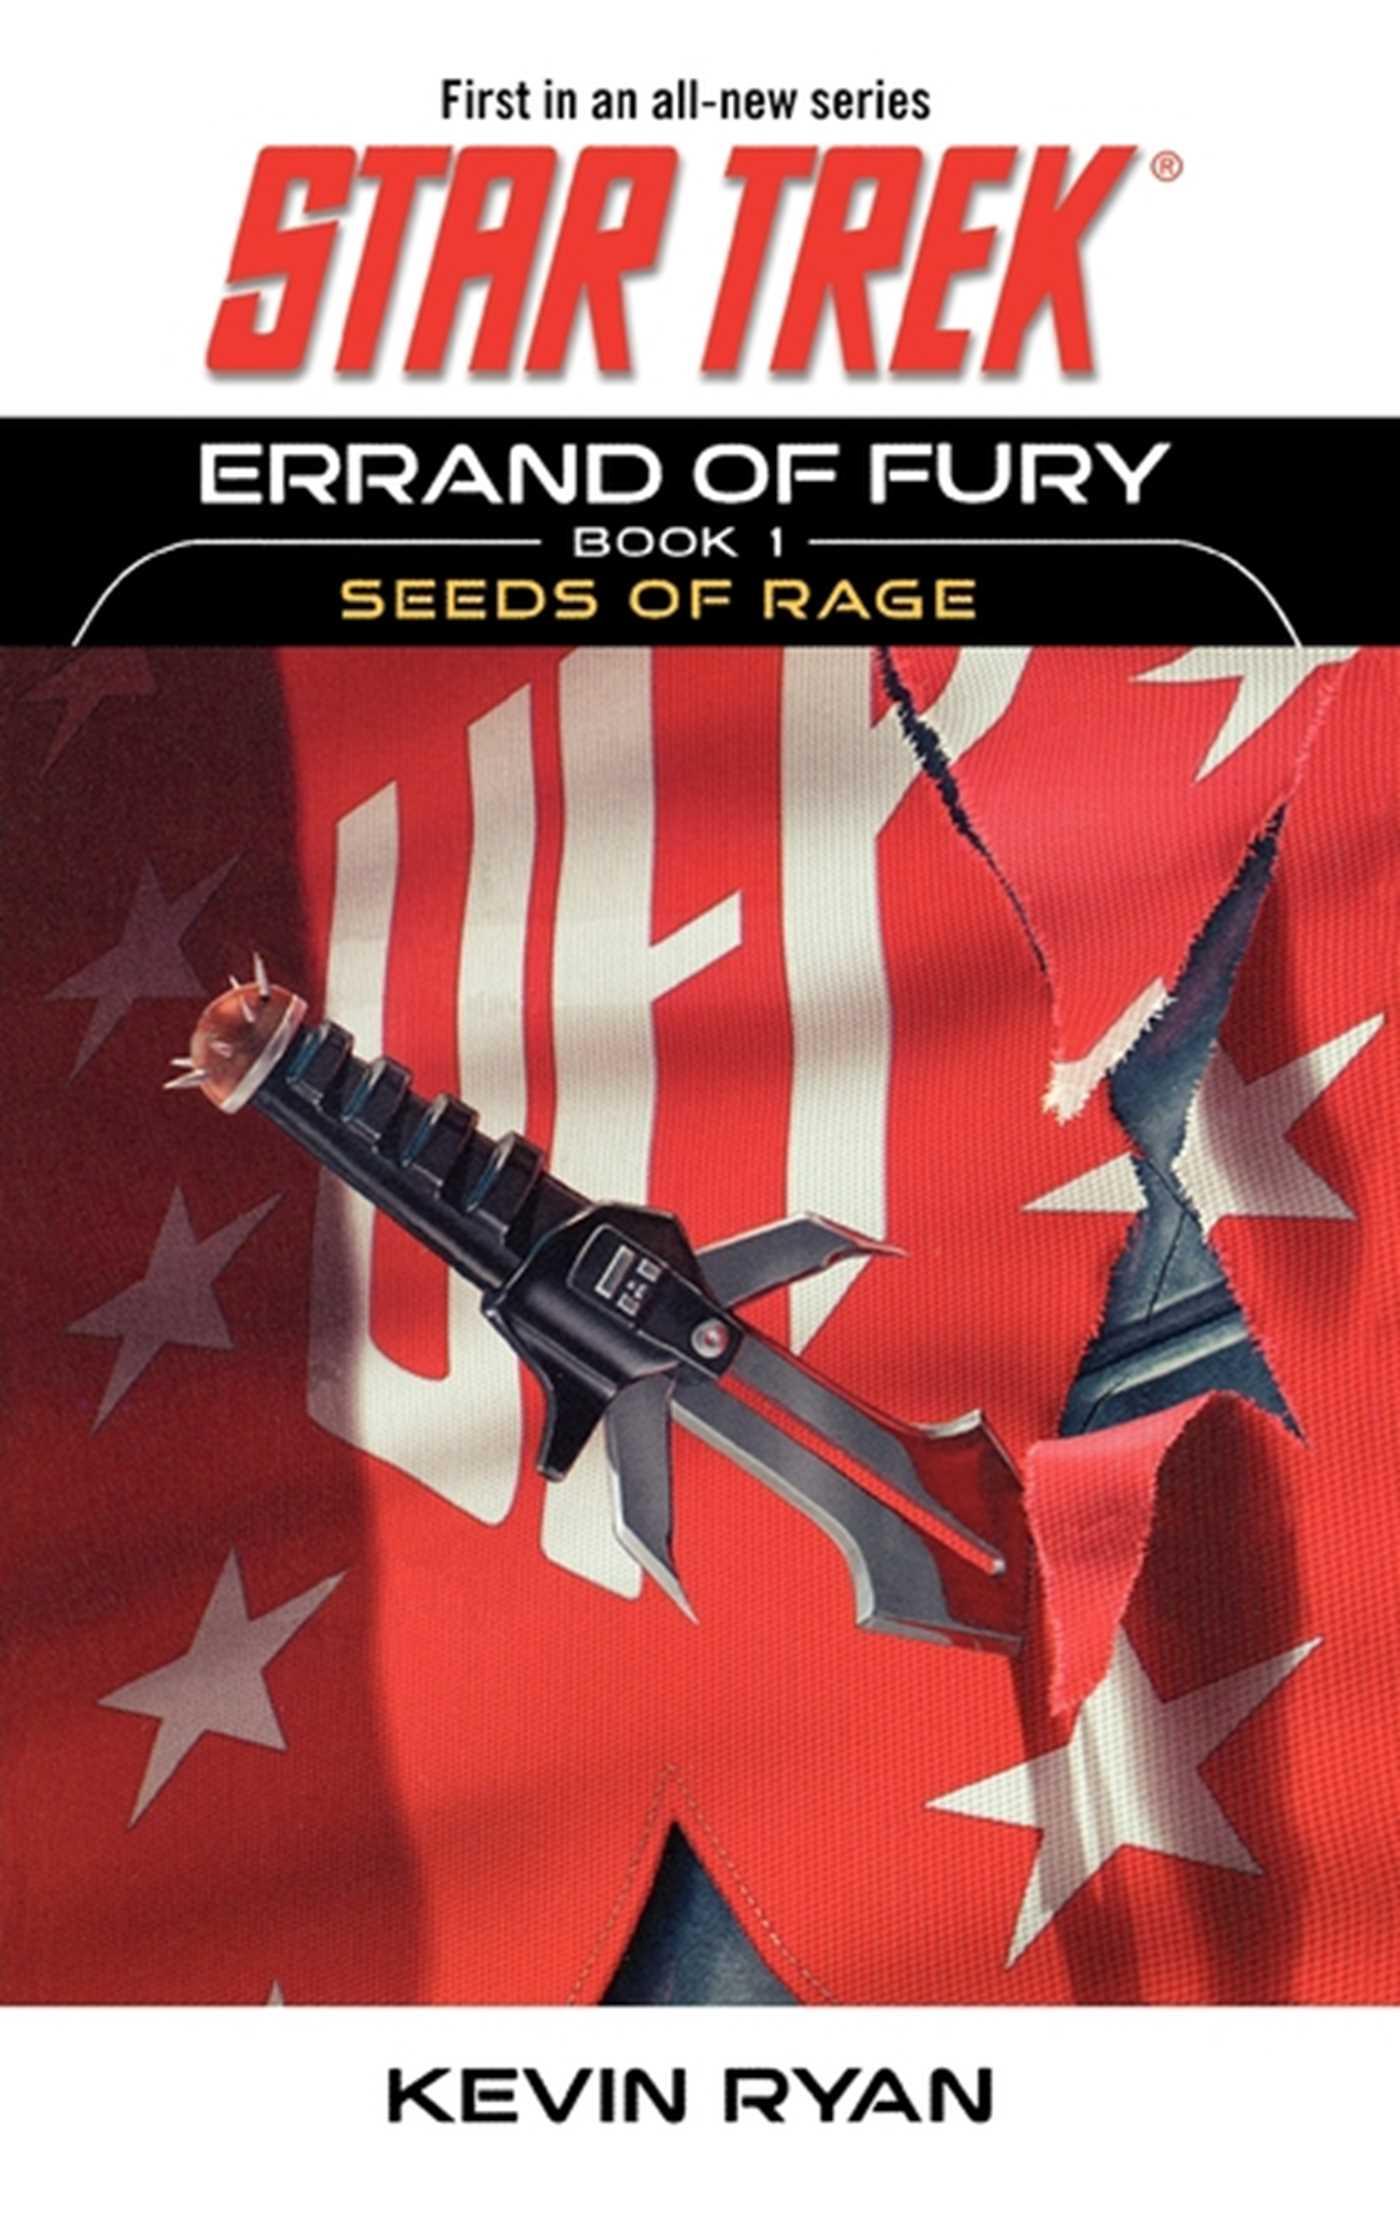 Star trek the original series errand of fury book 1 seeds of rage 9781416506768 hr